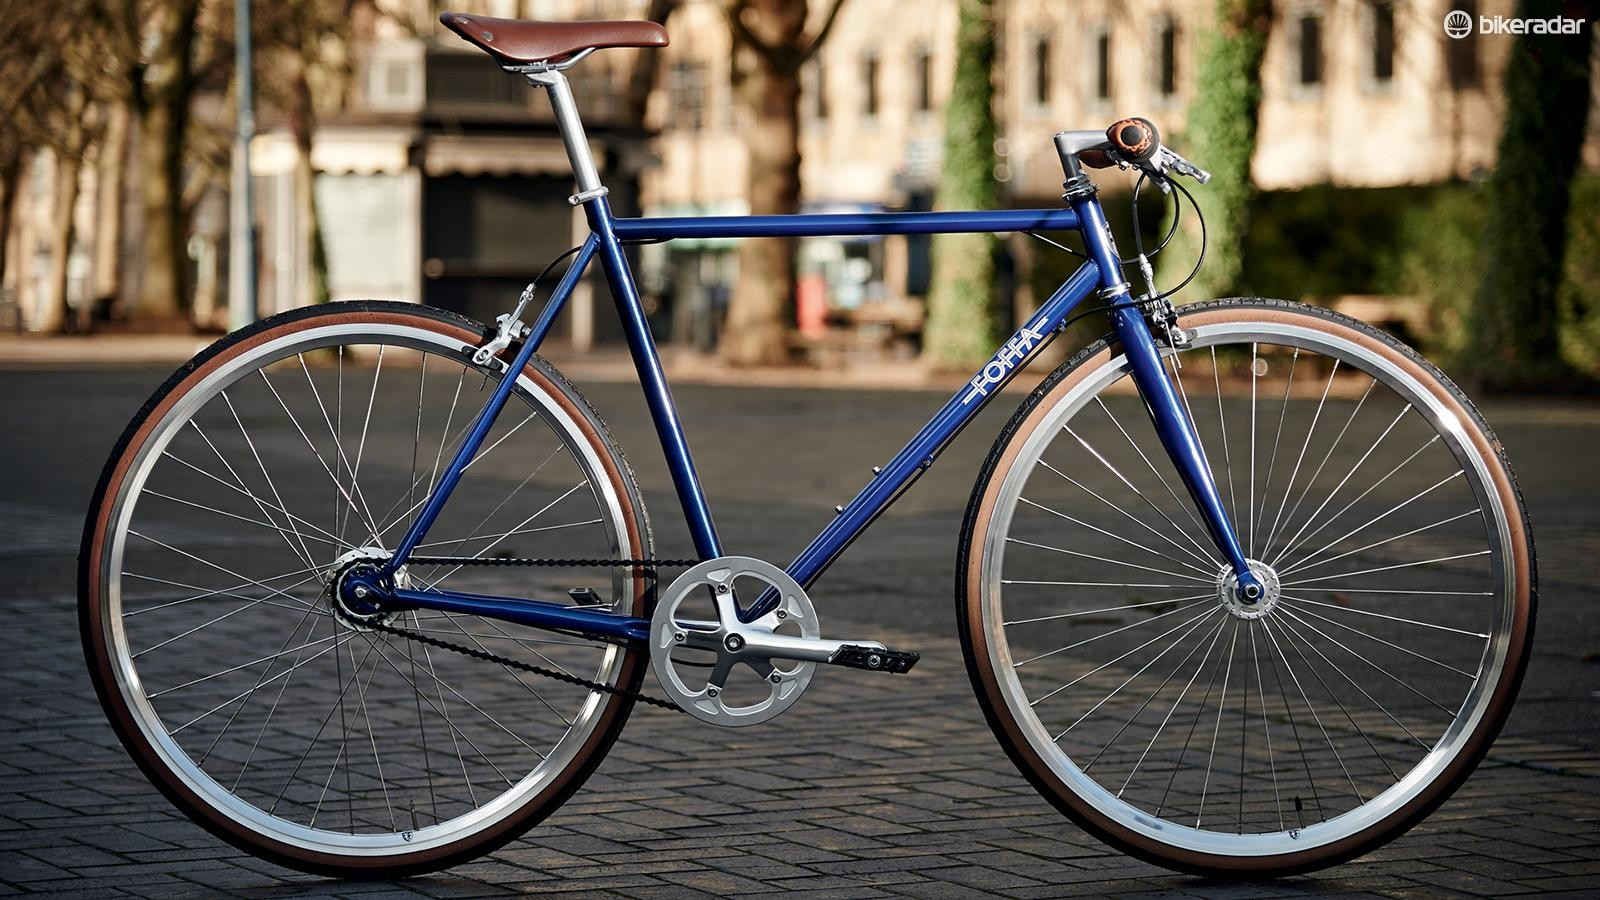 Foffa's Urban 7 is a nimble-handling ride